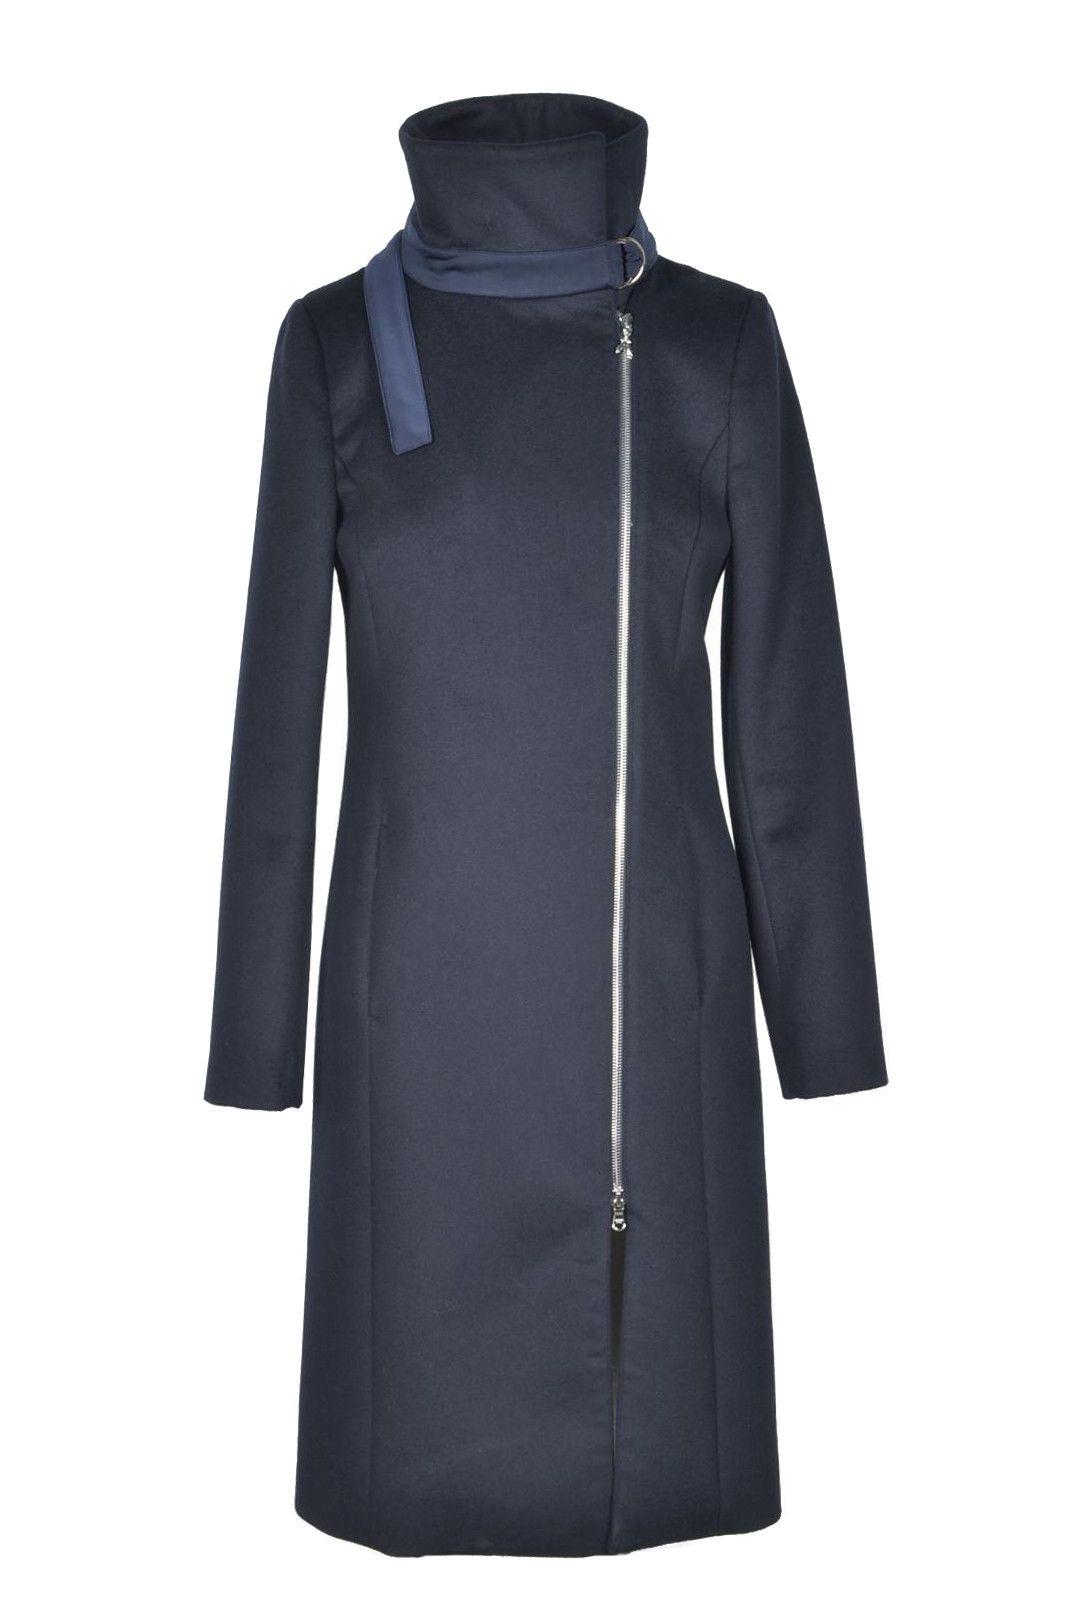 Patrizia Pepe Women's Coat In Blue